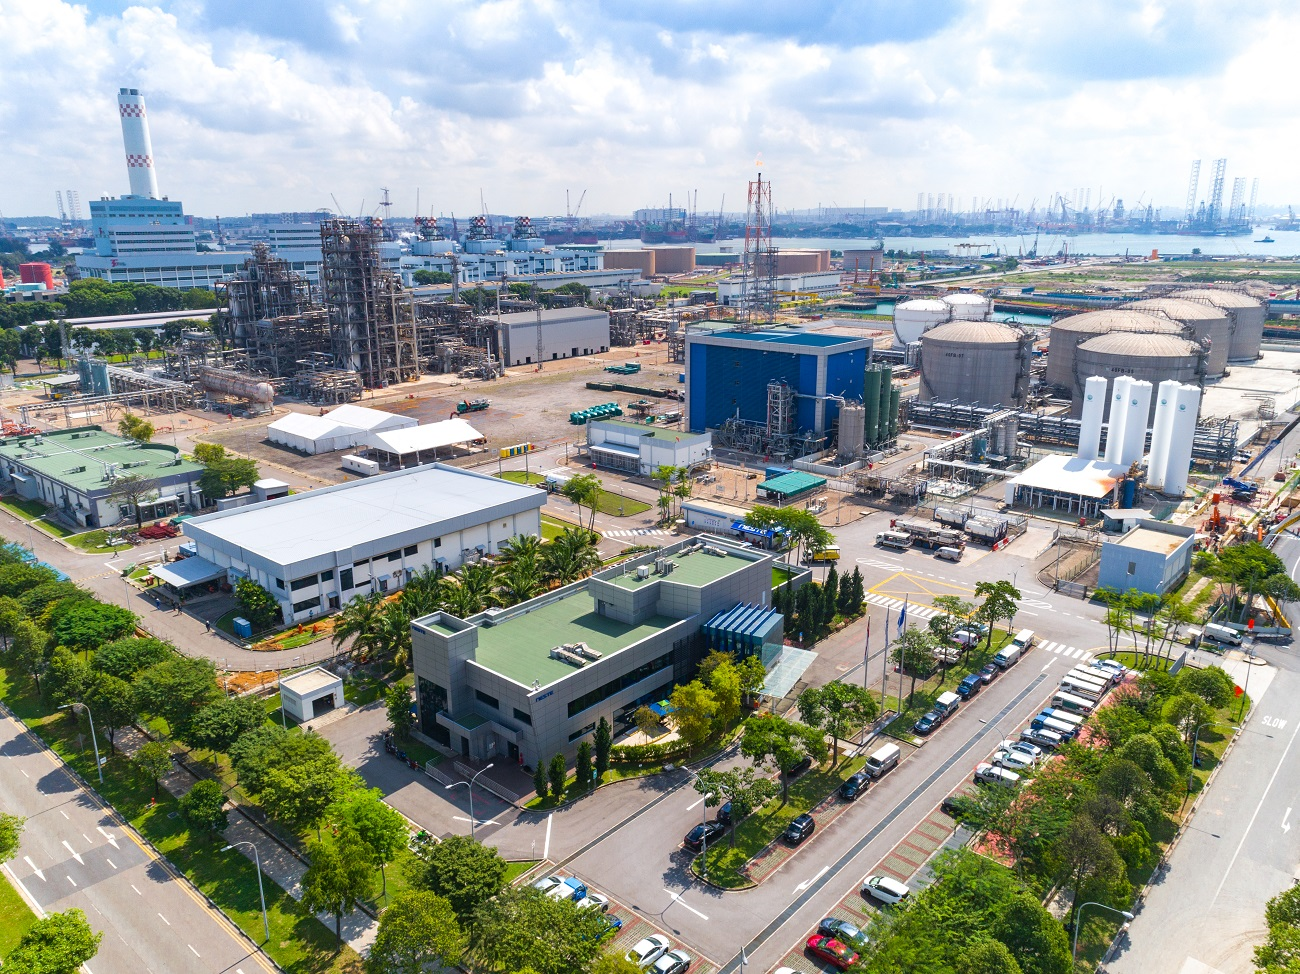 Drone image_Neste Singapore Refinery